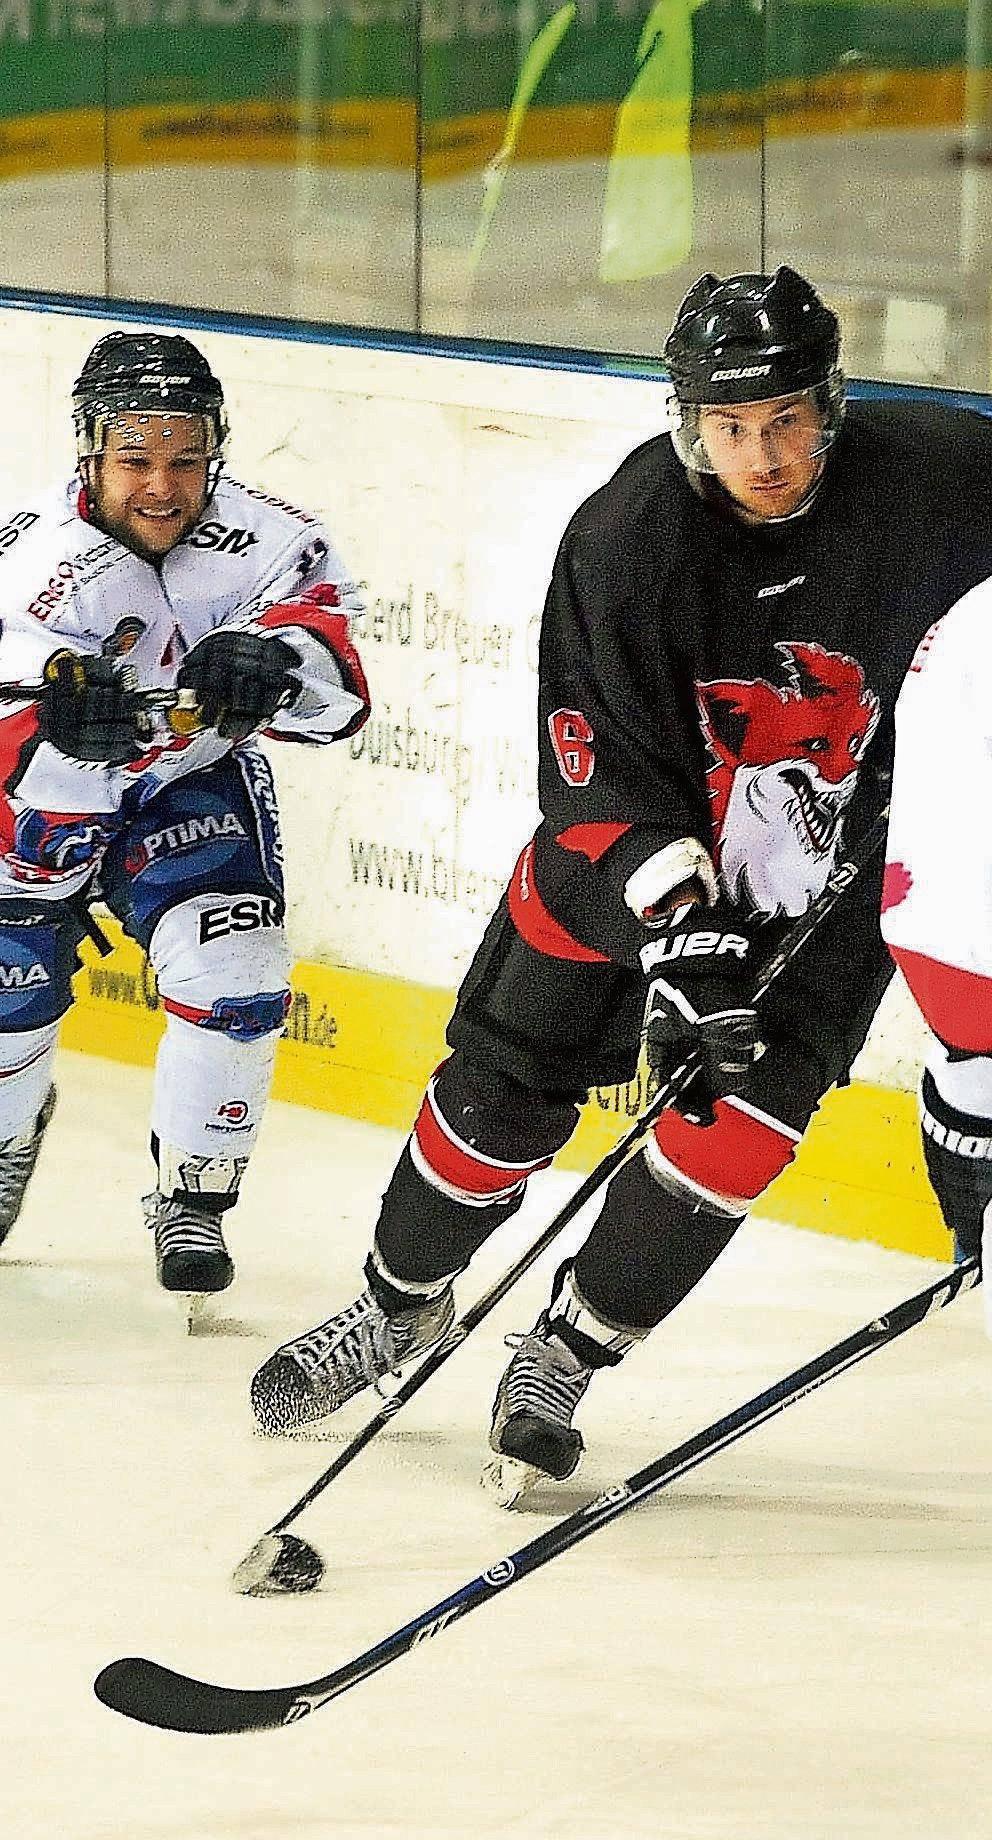 Eishockey Kassel